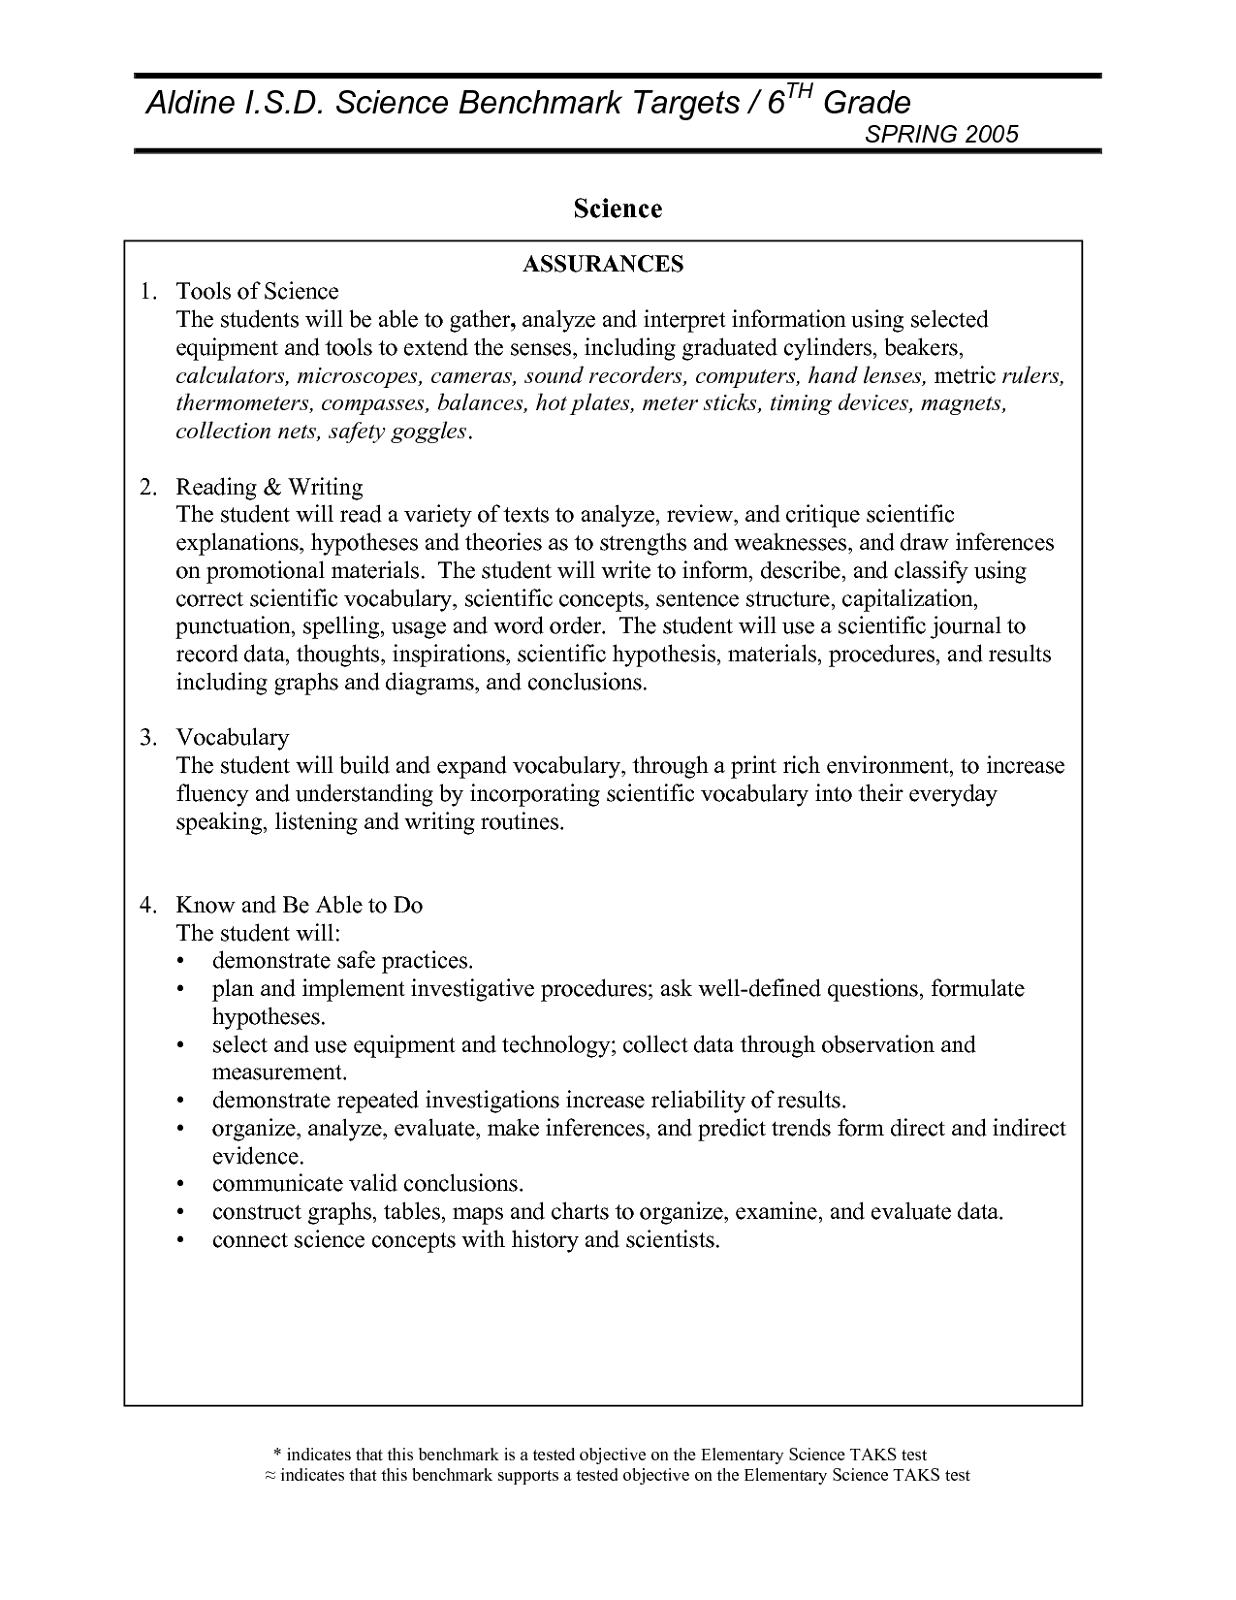 Worksheets 6th Grade Science Worksheets